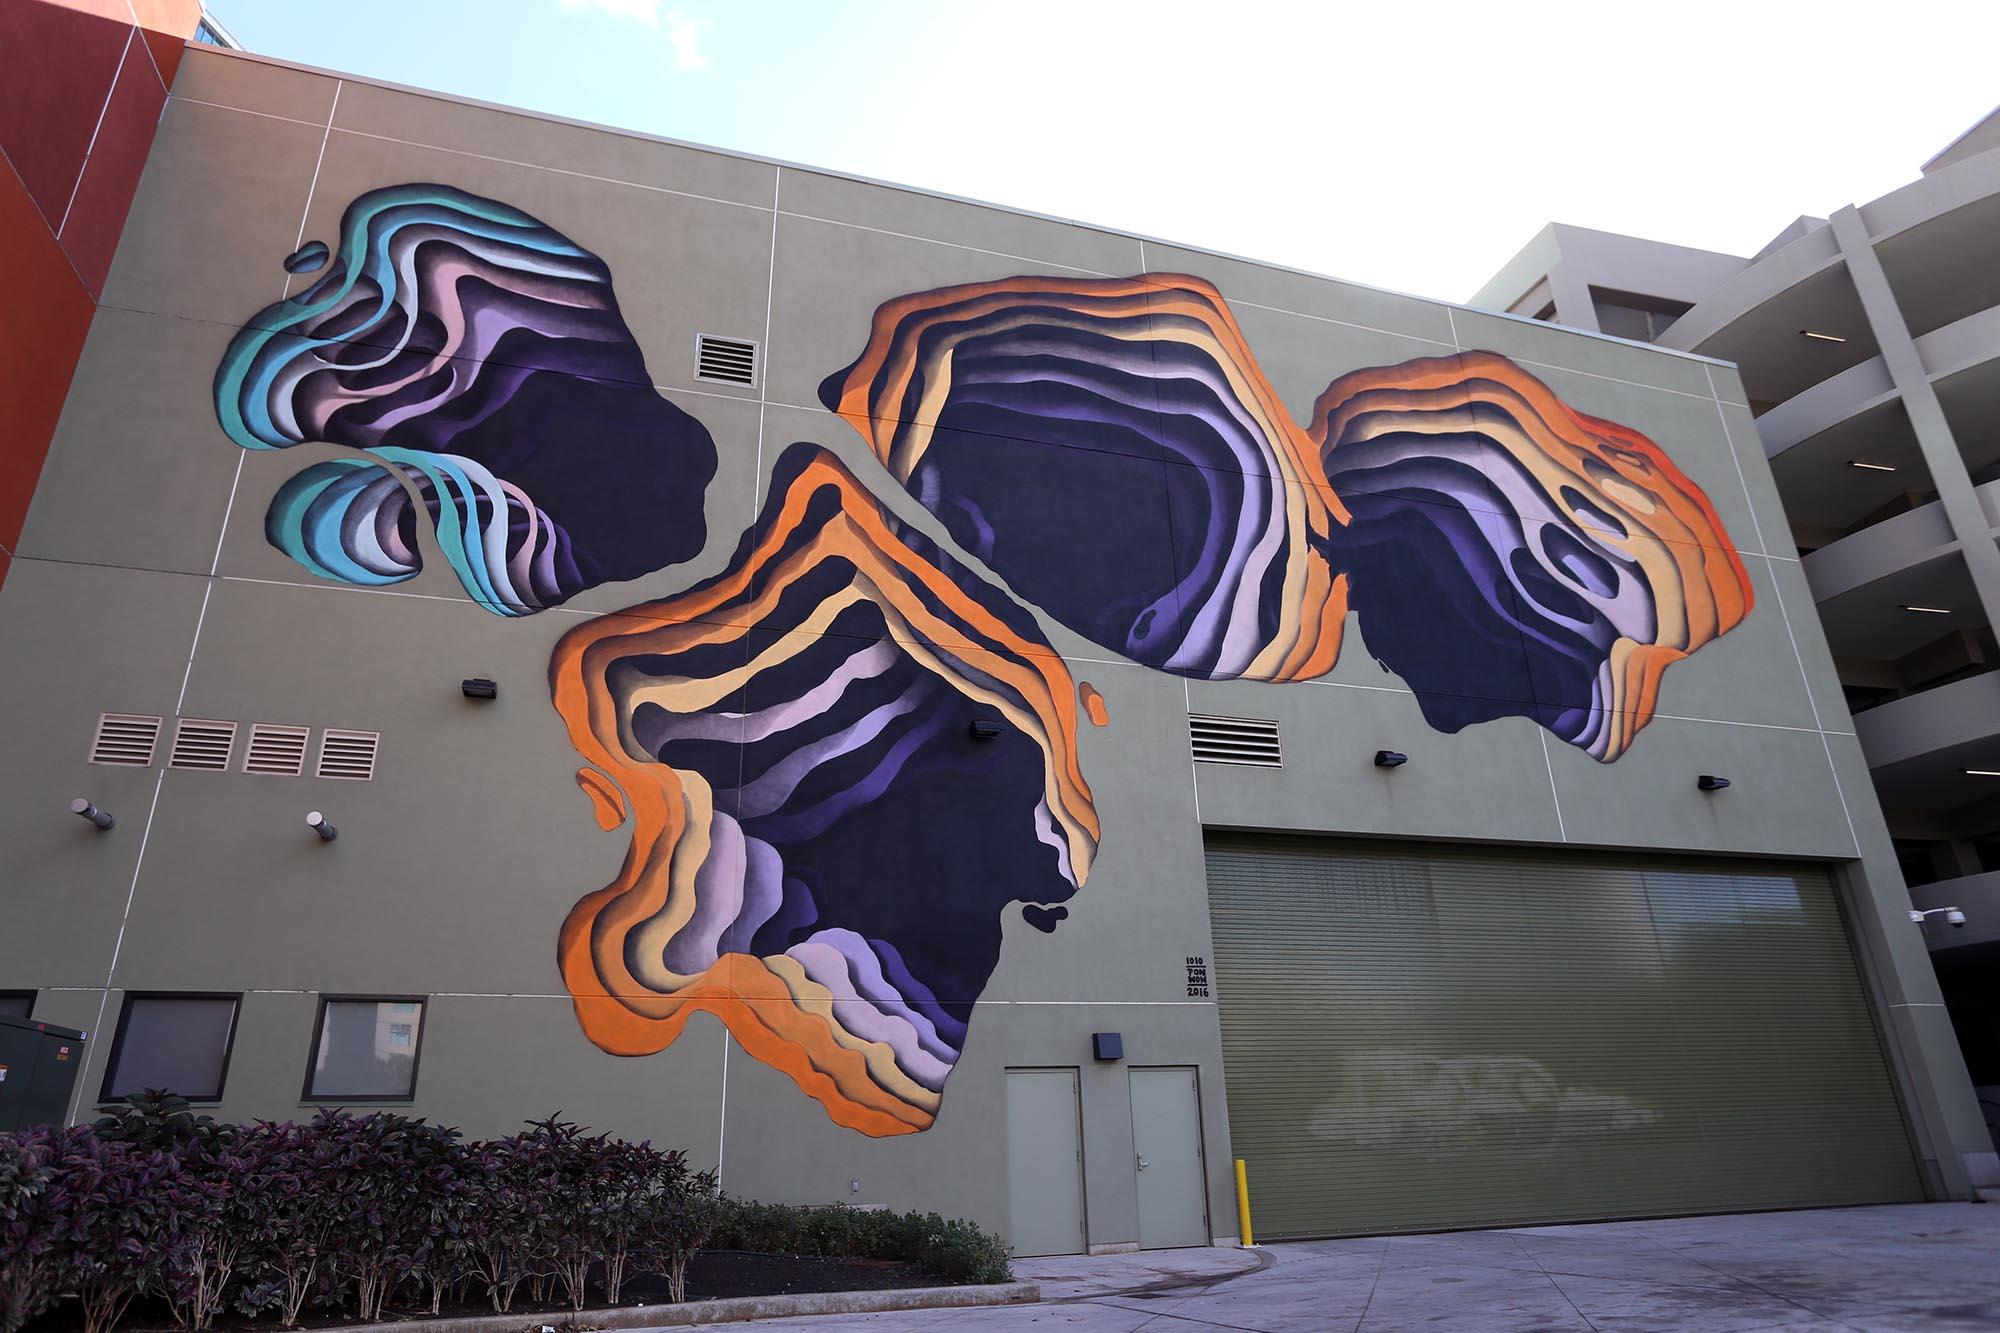 1010-festival-pow-wow-mural-grafite-dionisio-arte (7)